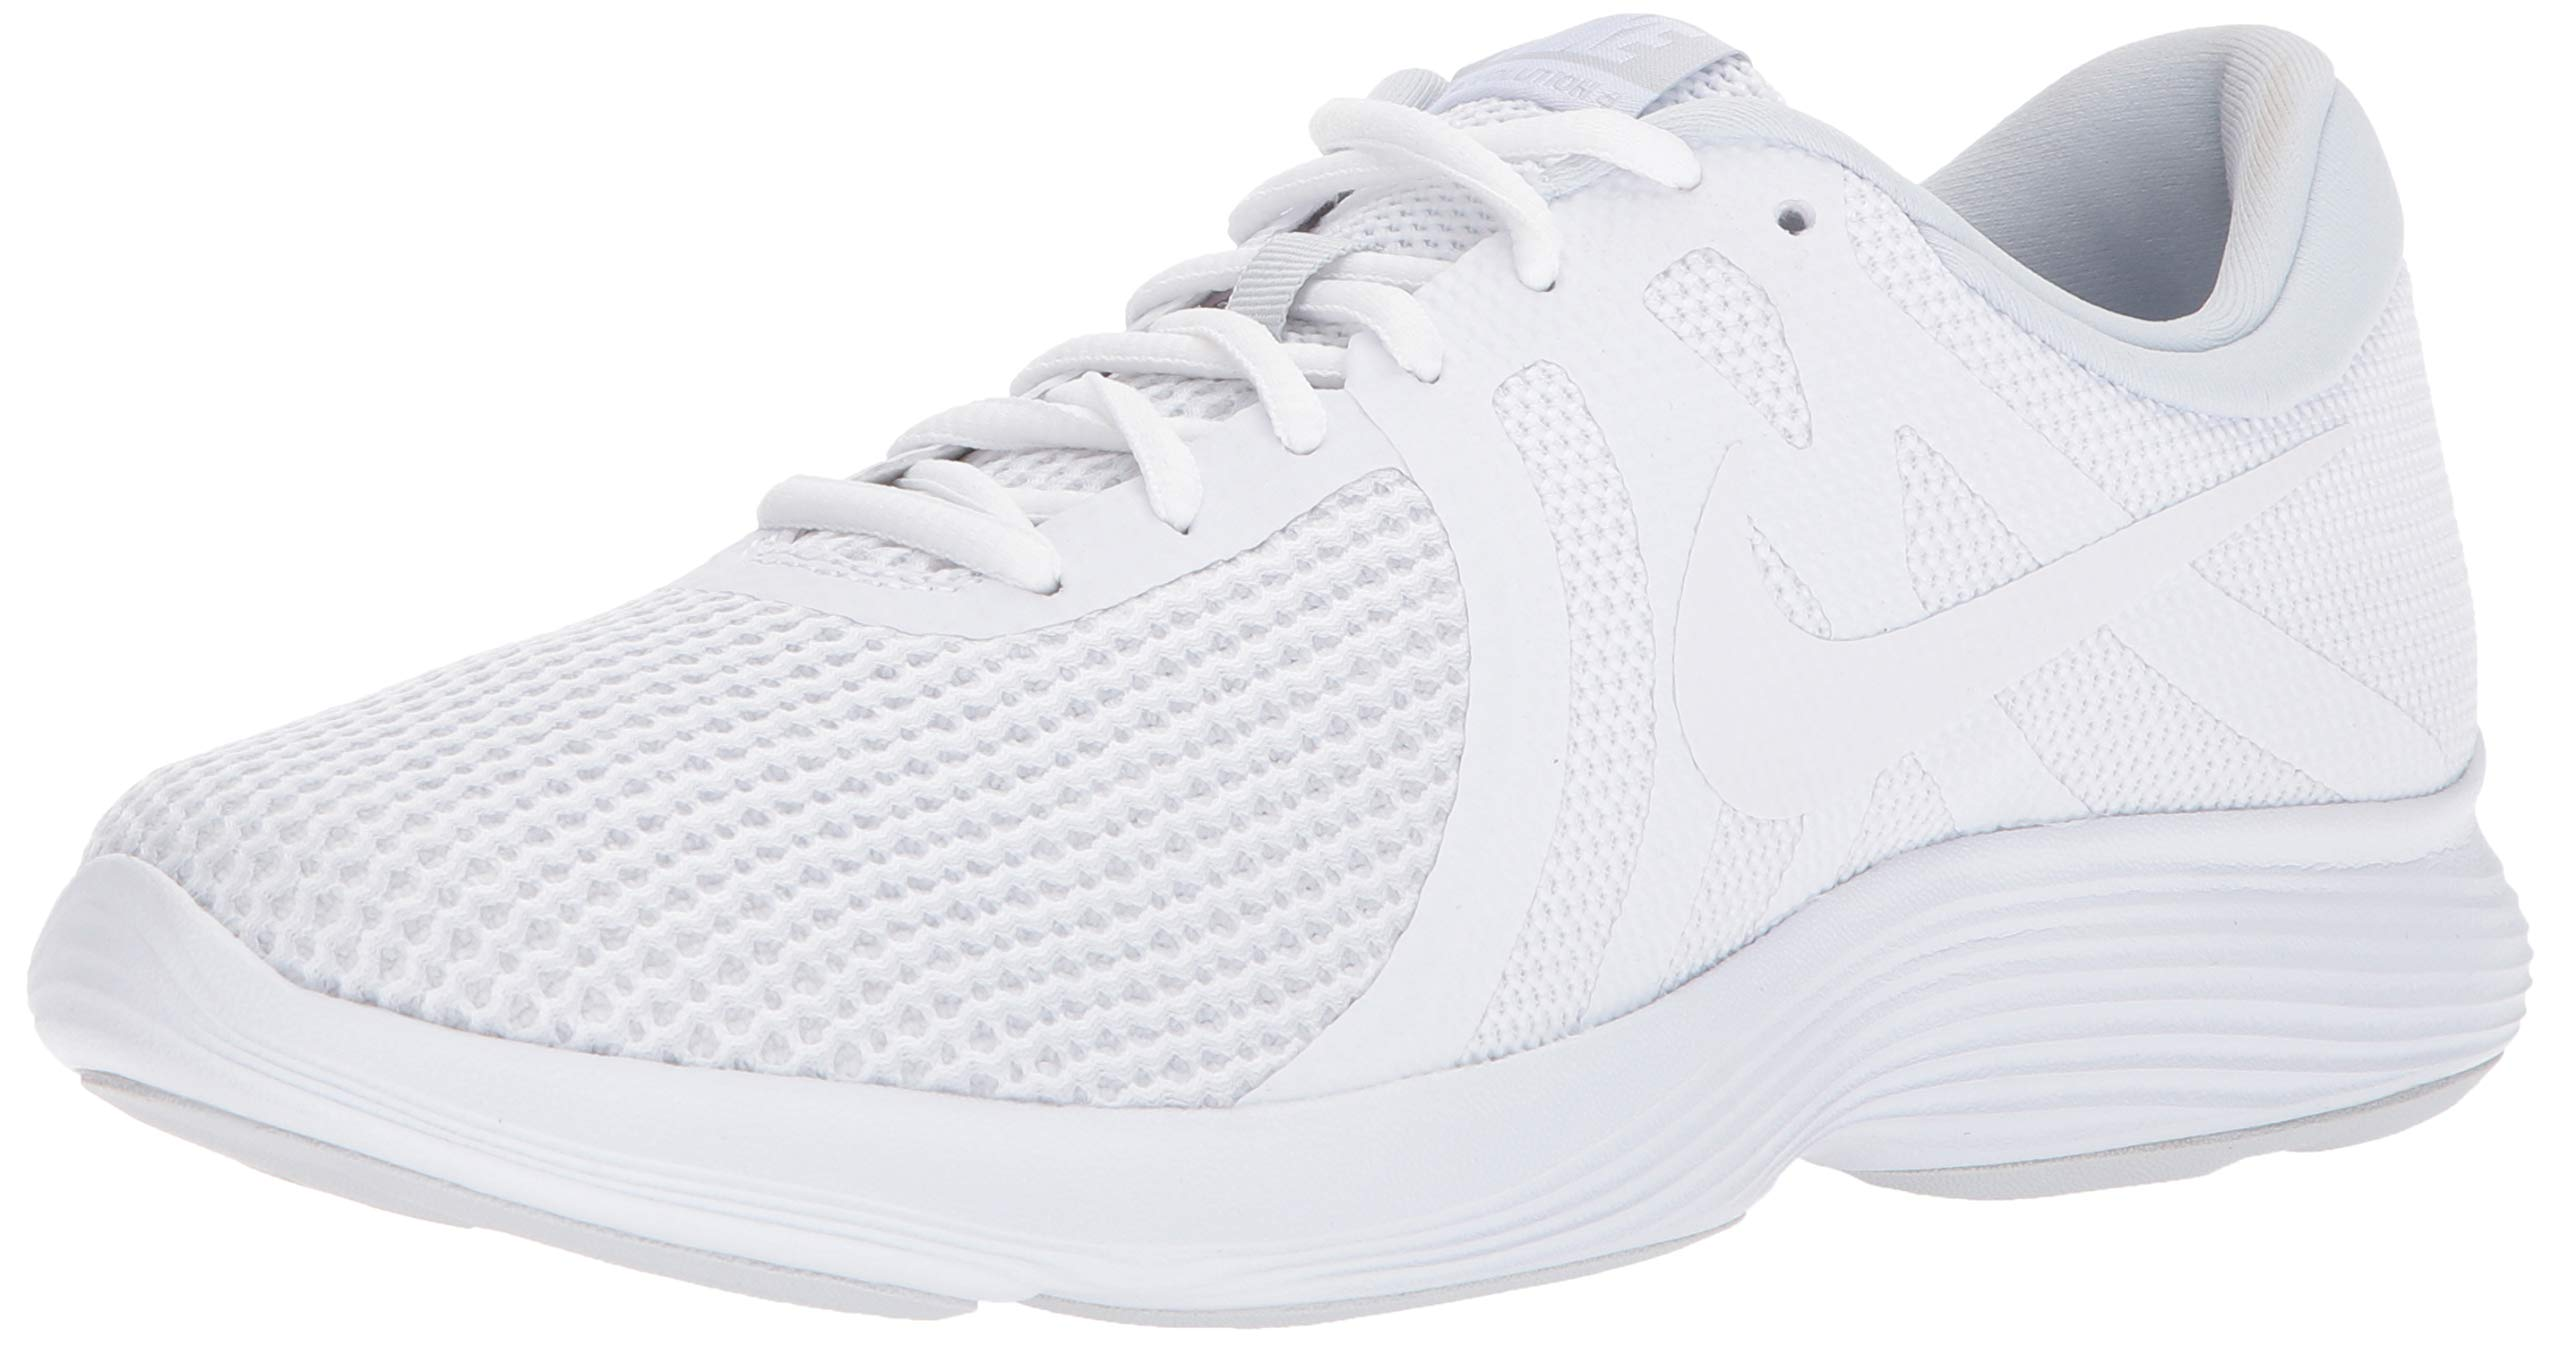 Nike Men's Revolution 4 Running Shoe, White/White - Pure Platinum, 15 4E US by Nike